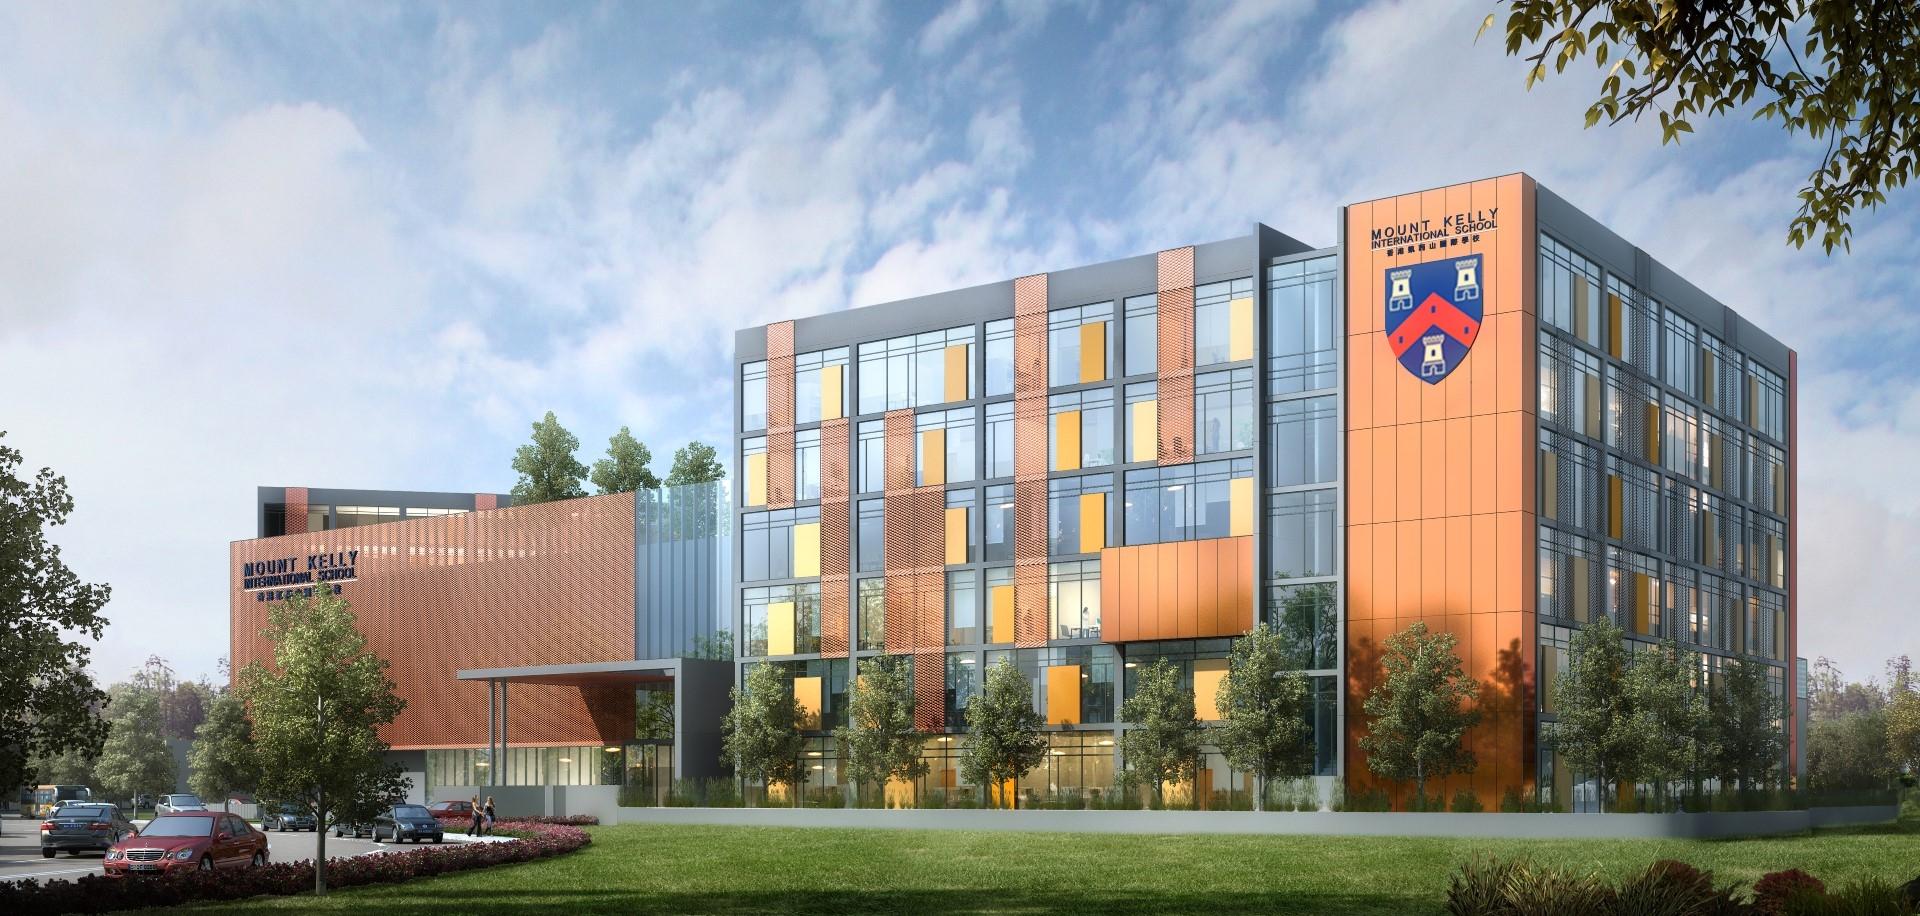 Famed UK prep school to open in Tuen Mun - The Standard